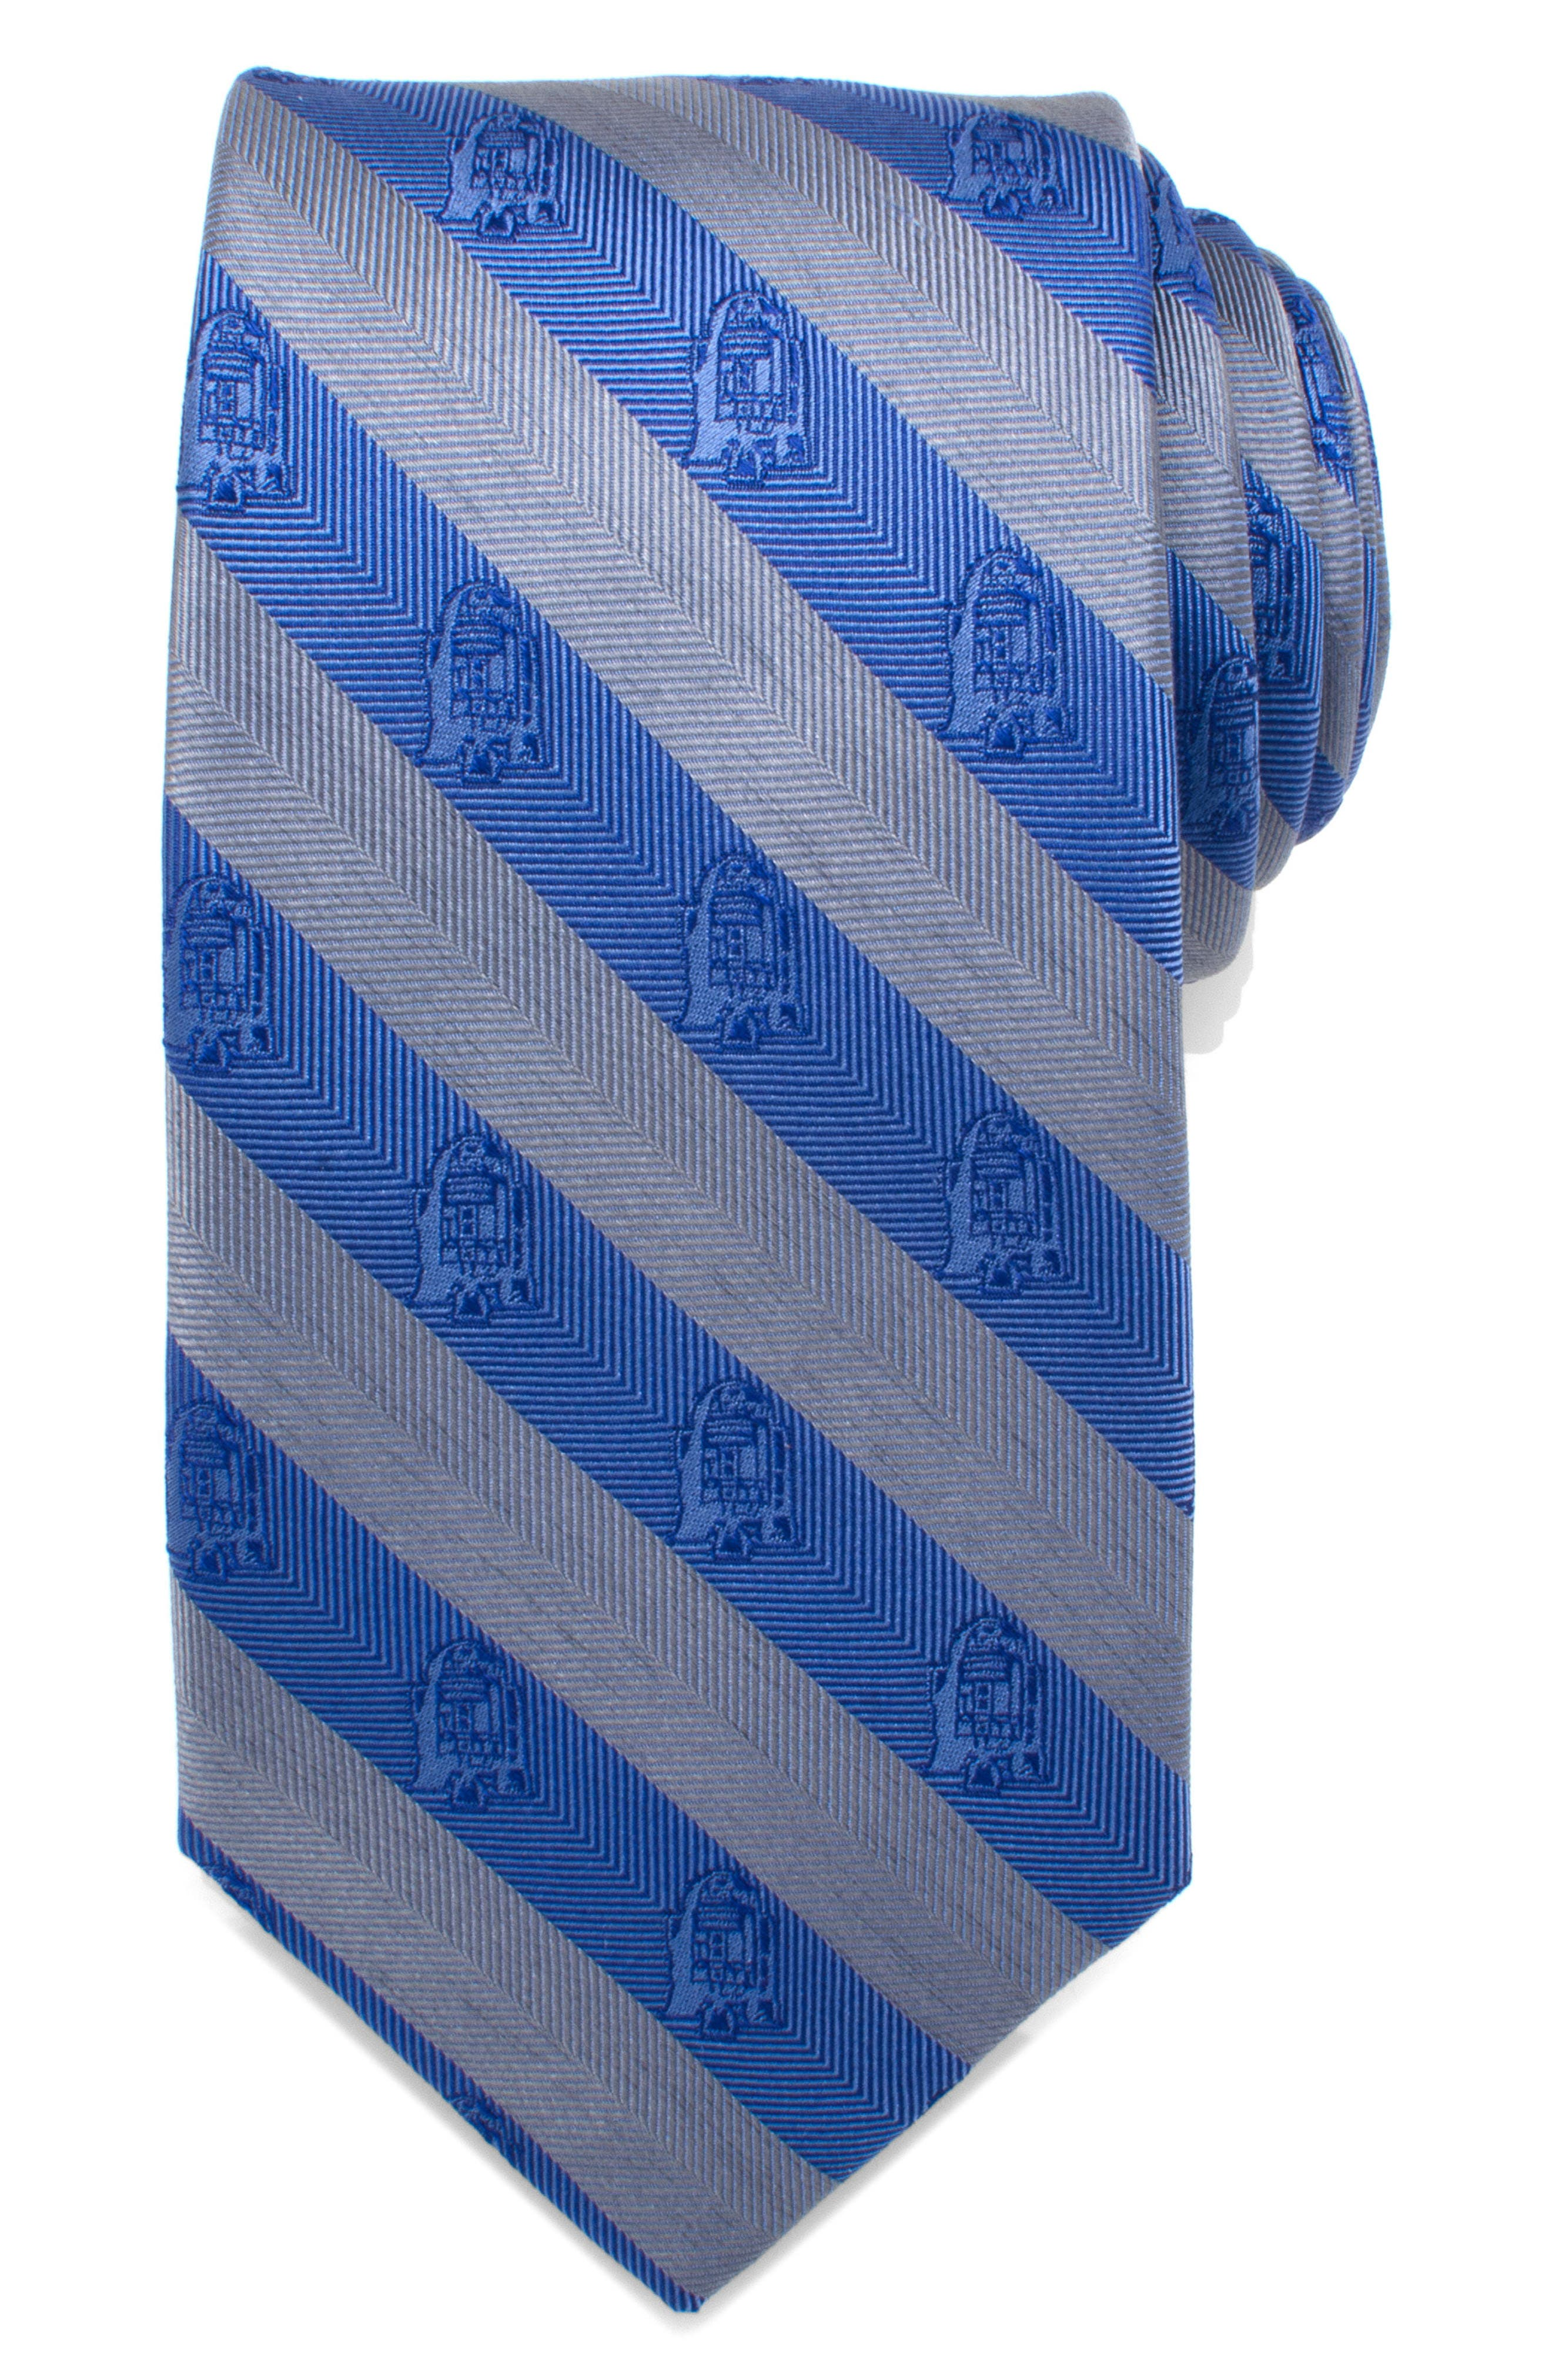 Cufflinks, Inc. Star Wars™ R2D2 Silk Tie